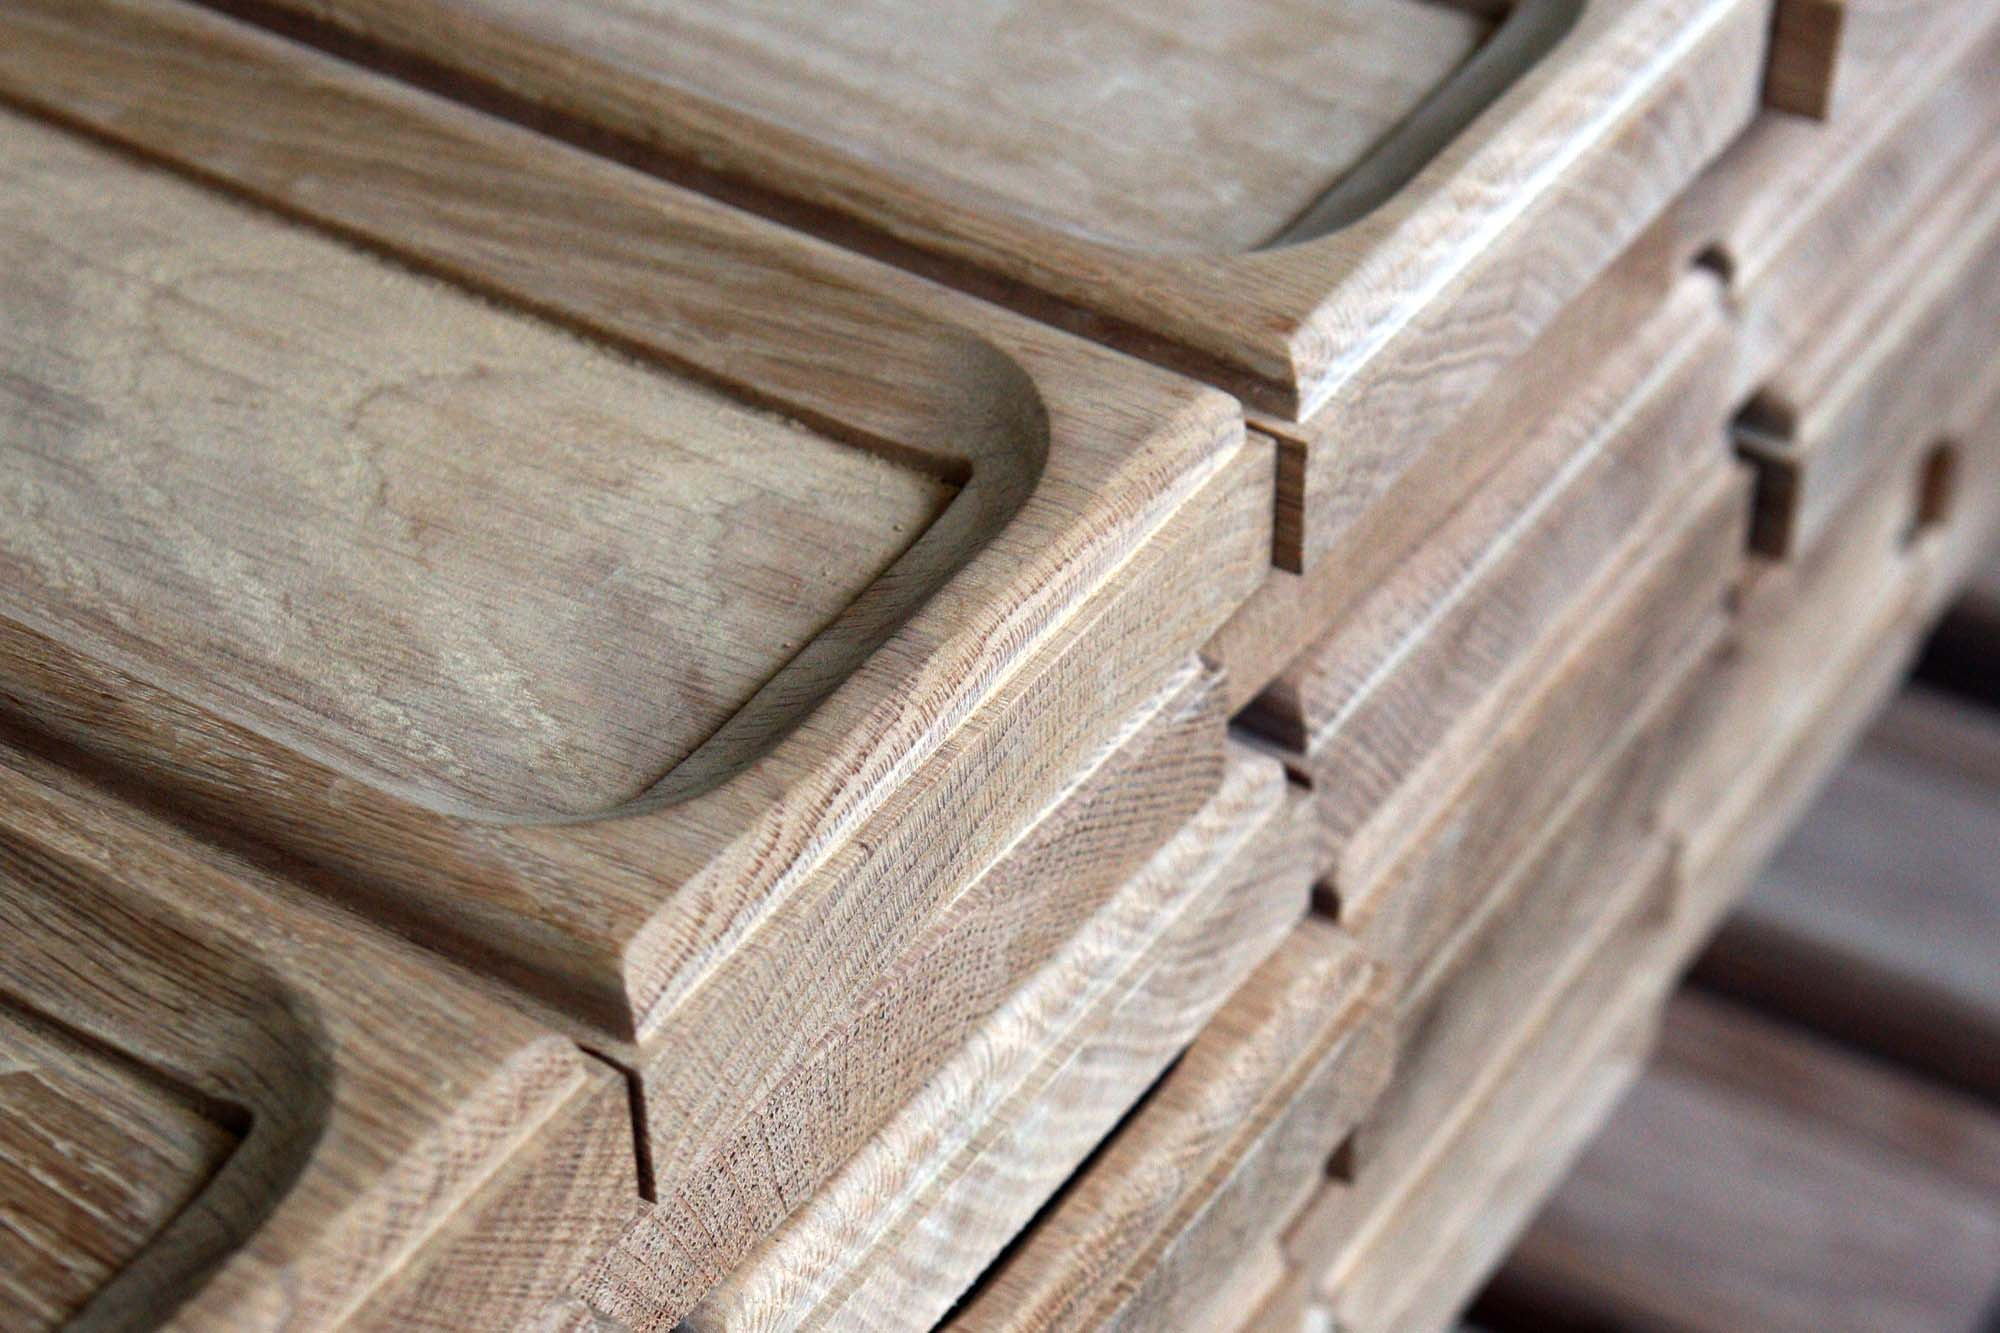 contempo-timbermachining_0000_1.jpg